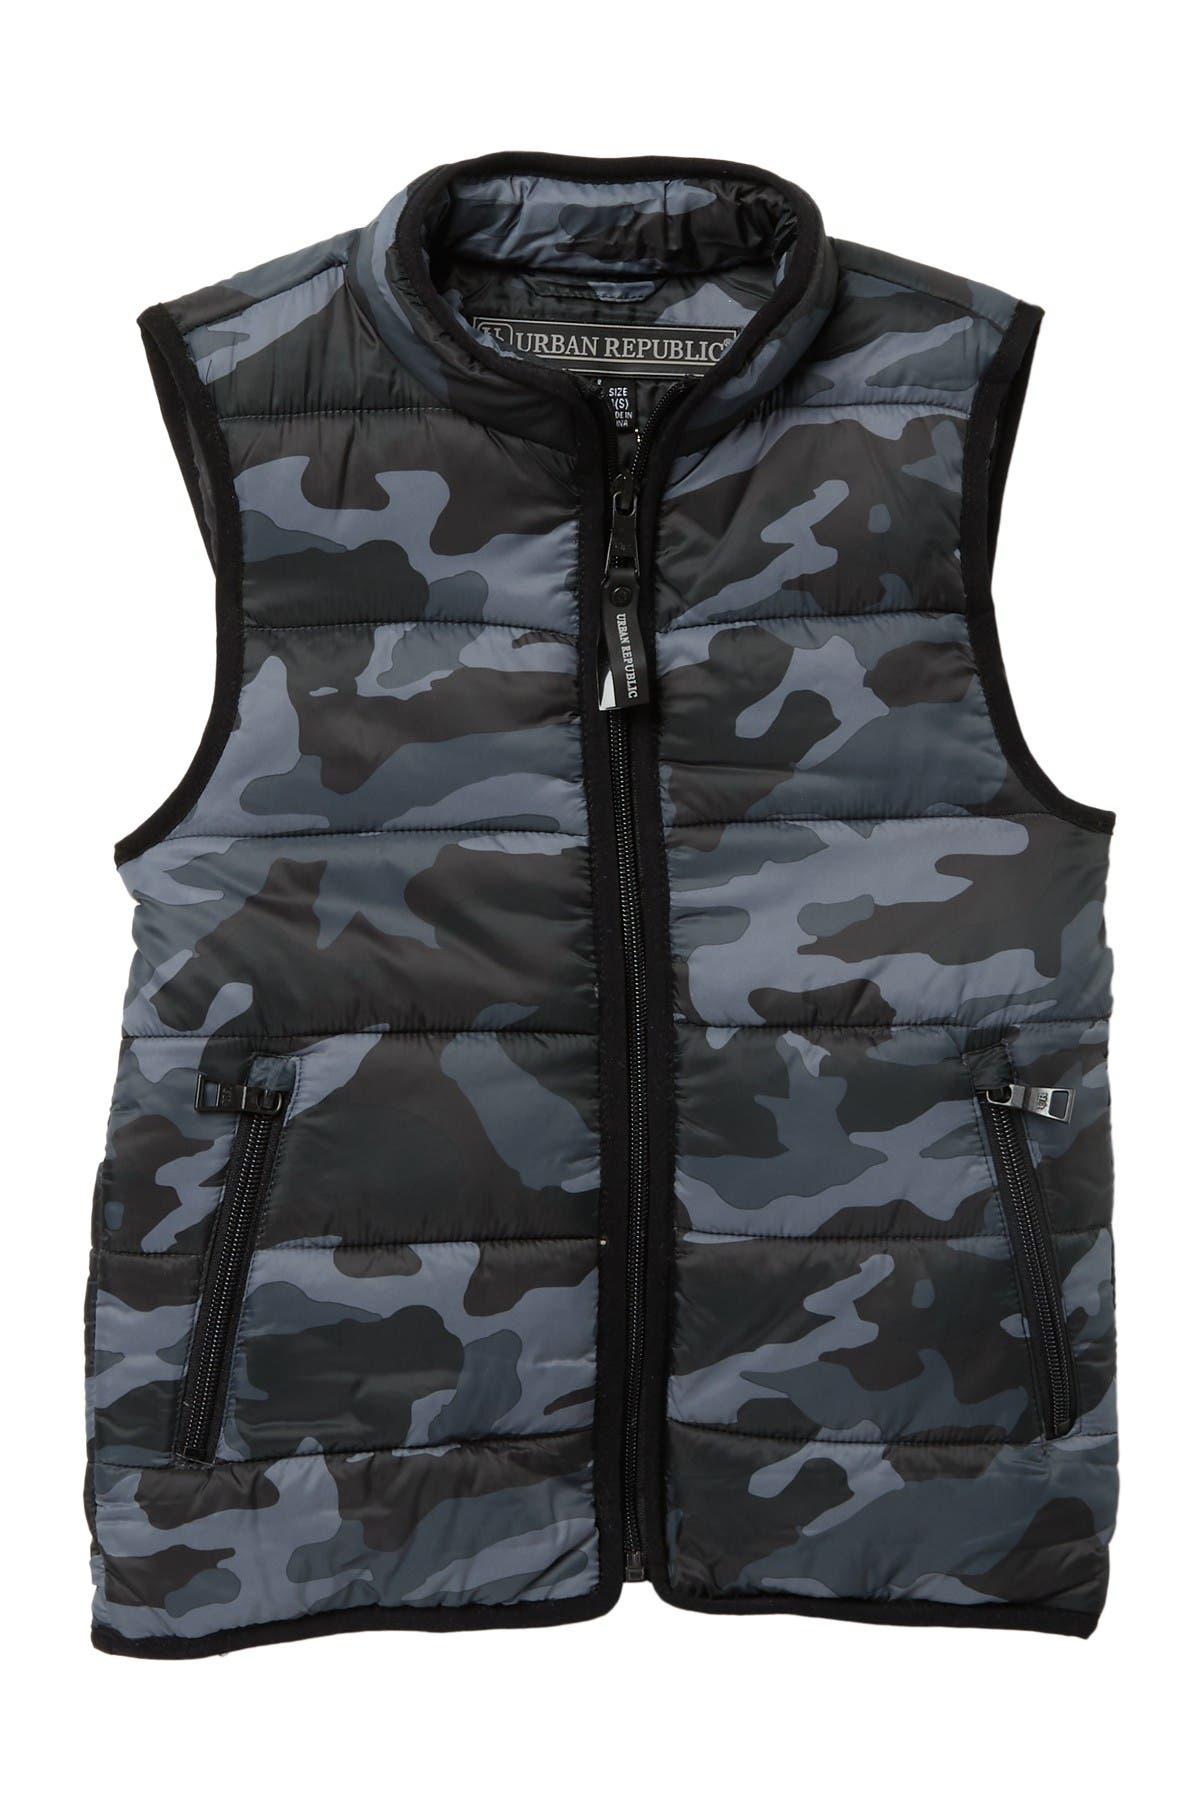 Image of Urban Republic Matte Ciree Reversible Vest